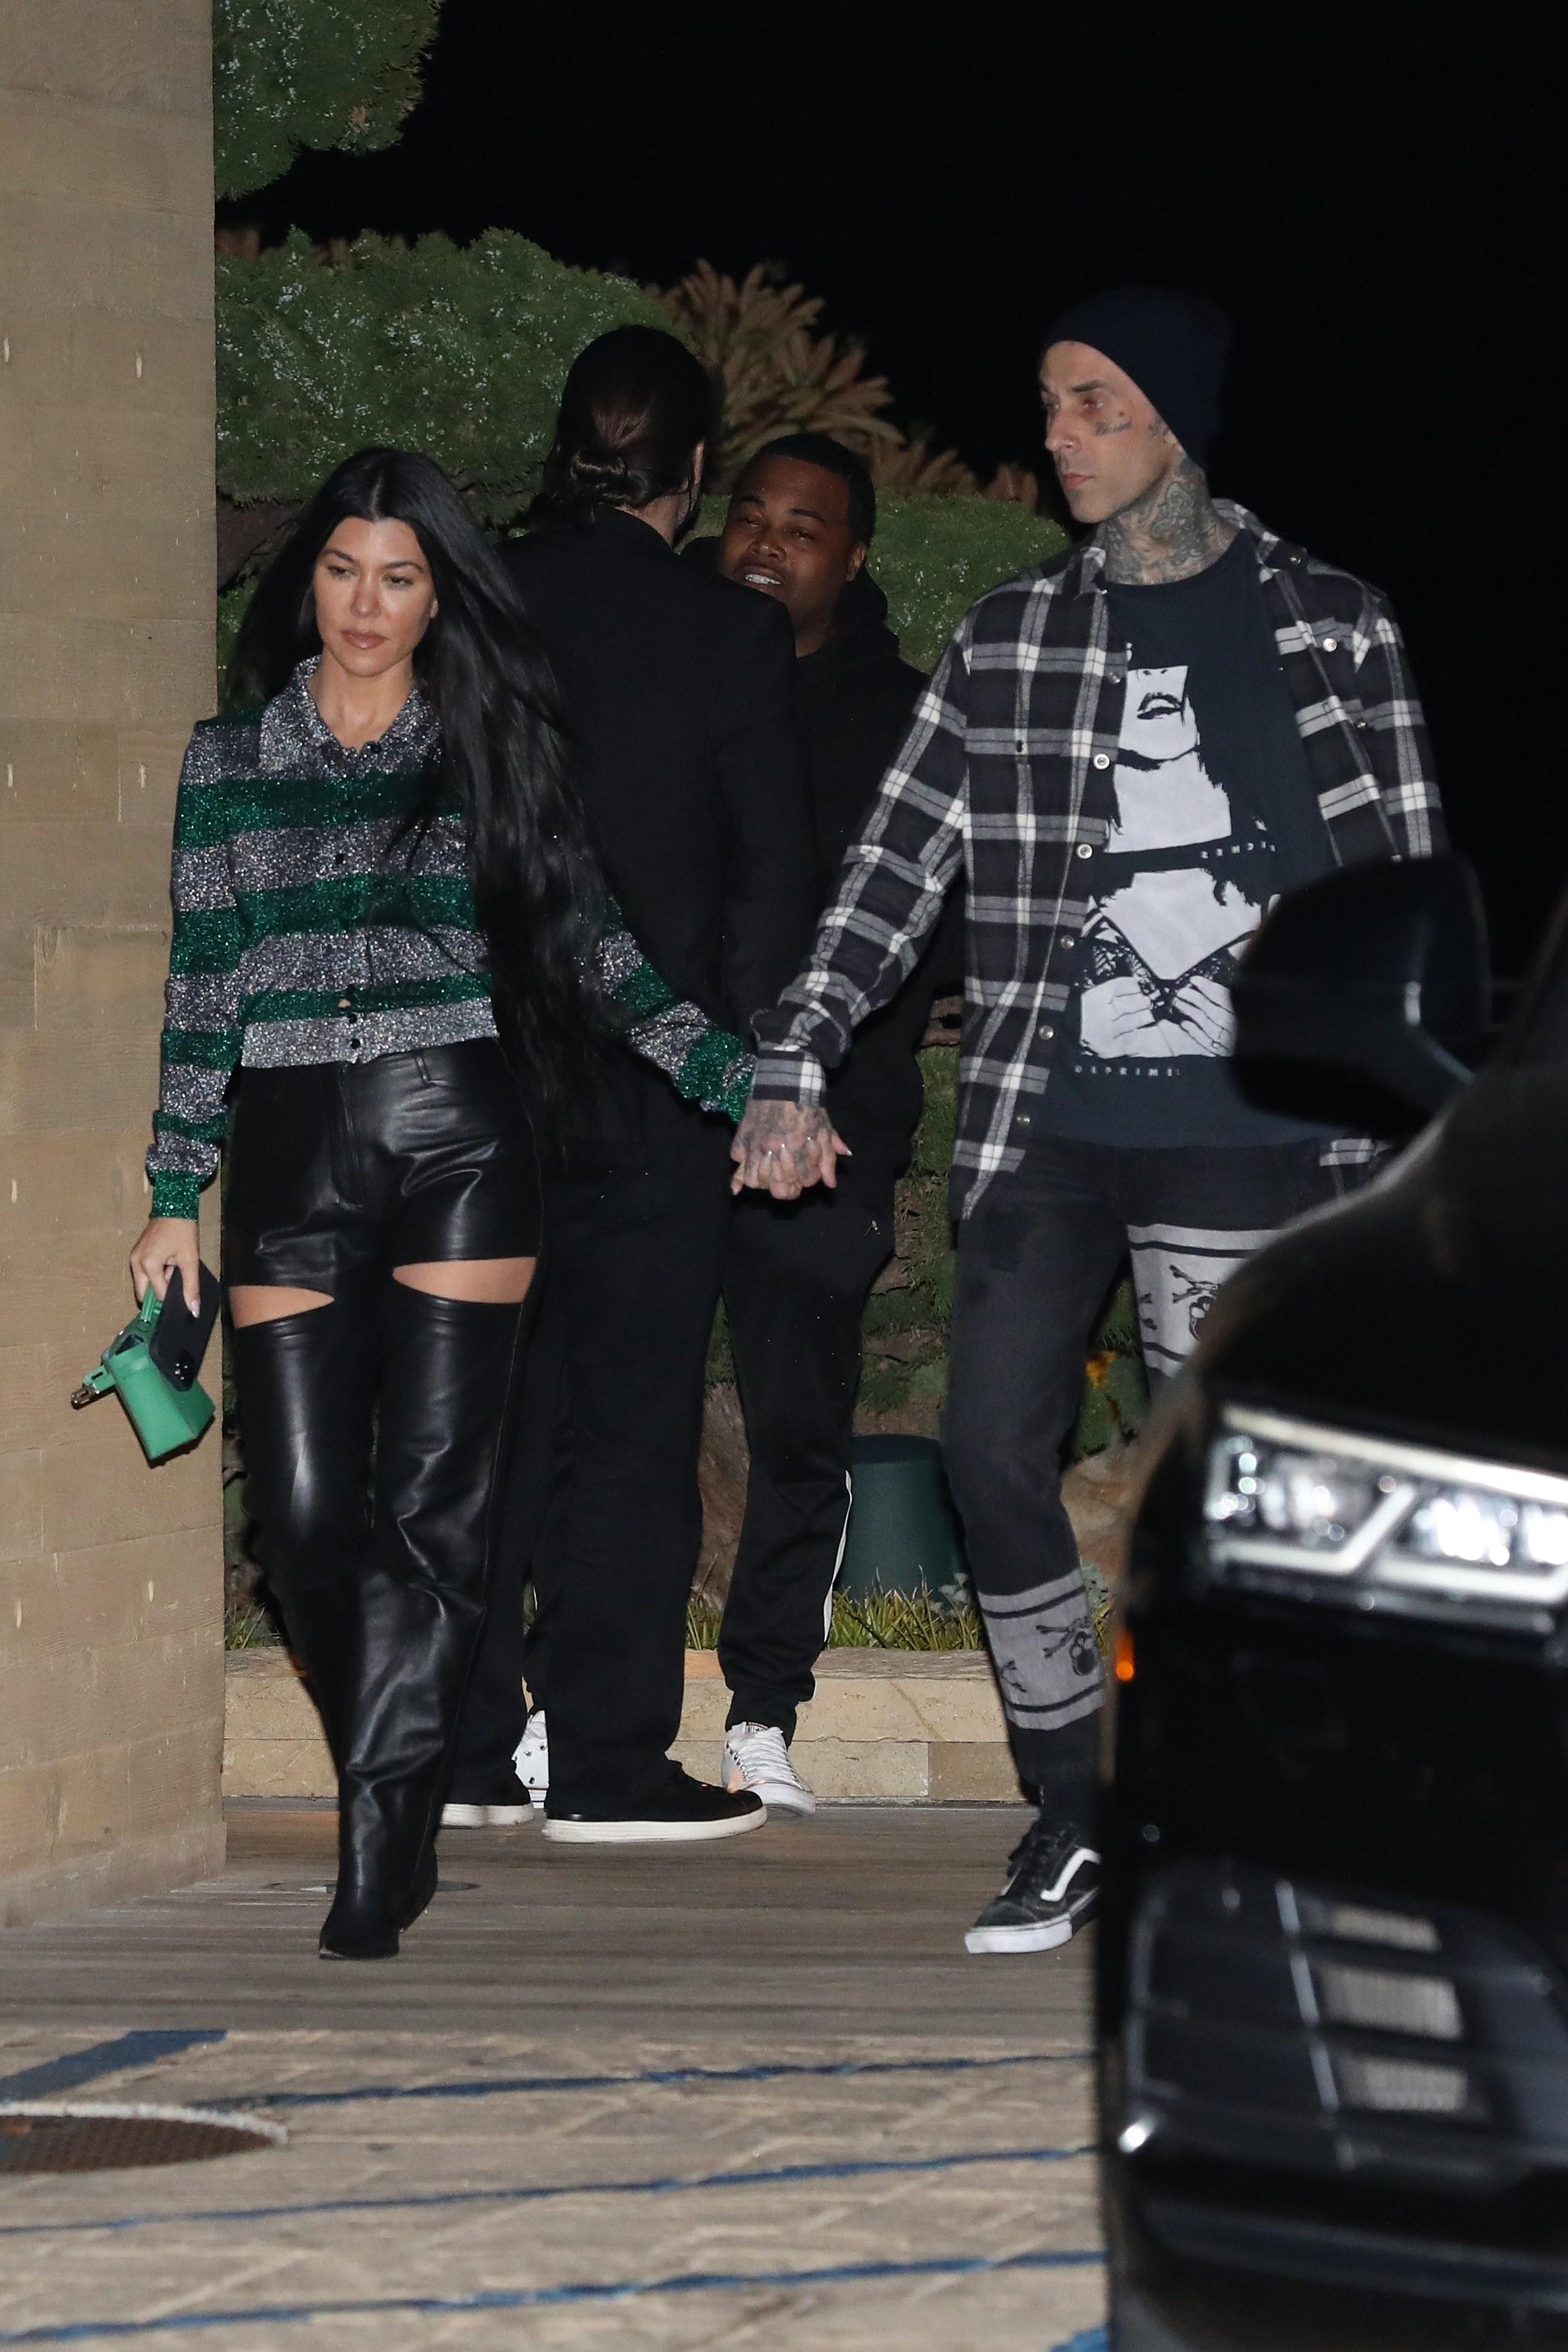 Kourtney Kardashian and Travis Barker are seen at Nobu restaurant on March 20, 2021 in Malibu, California